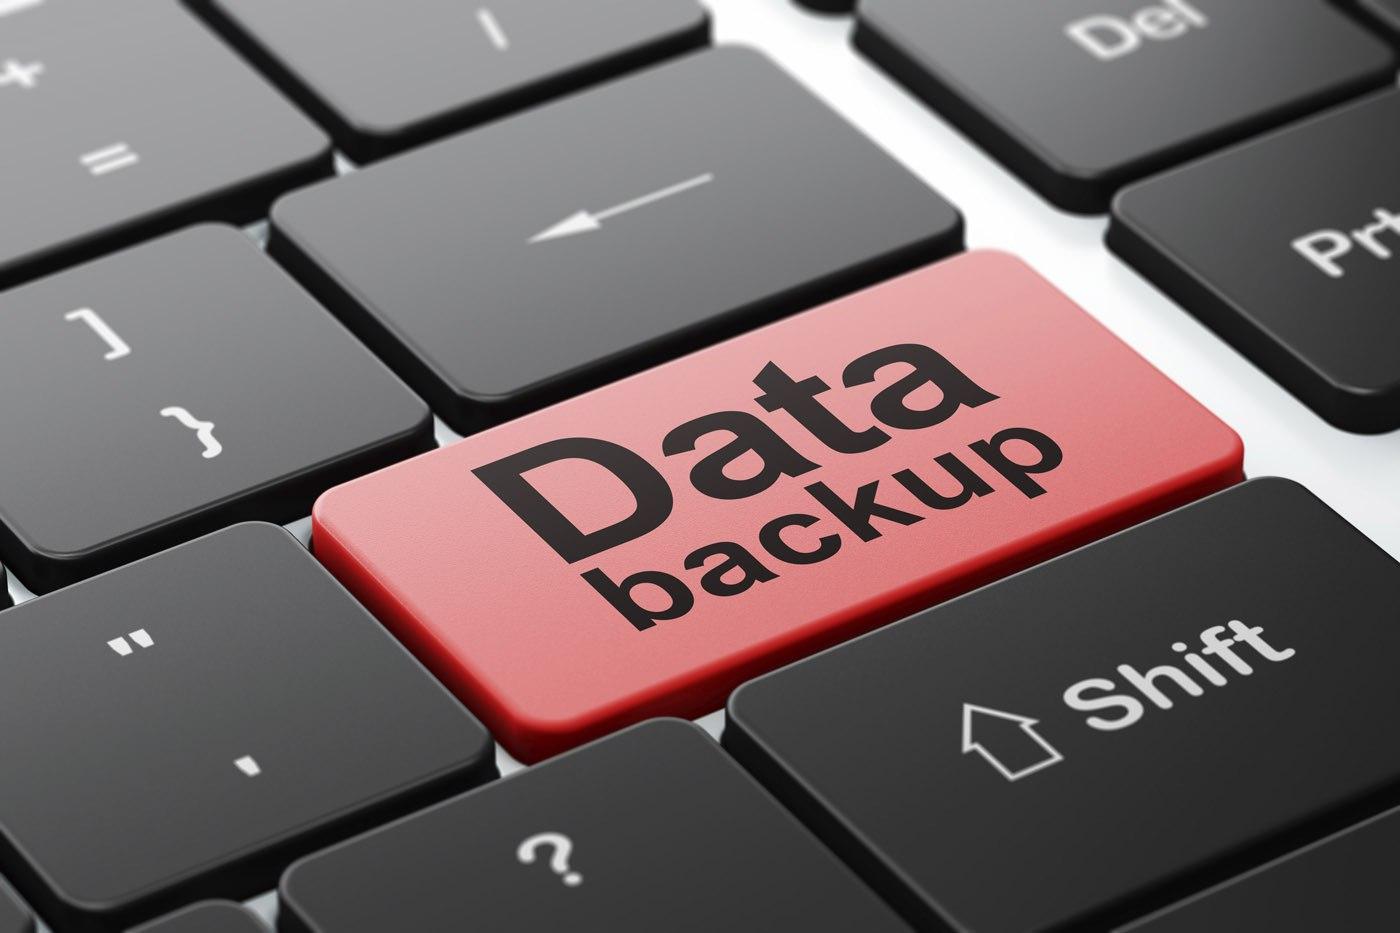 Plan for Hybrid Data Protection Media in 2016